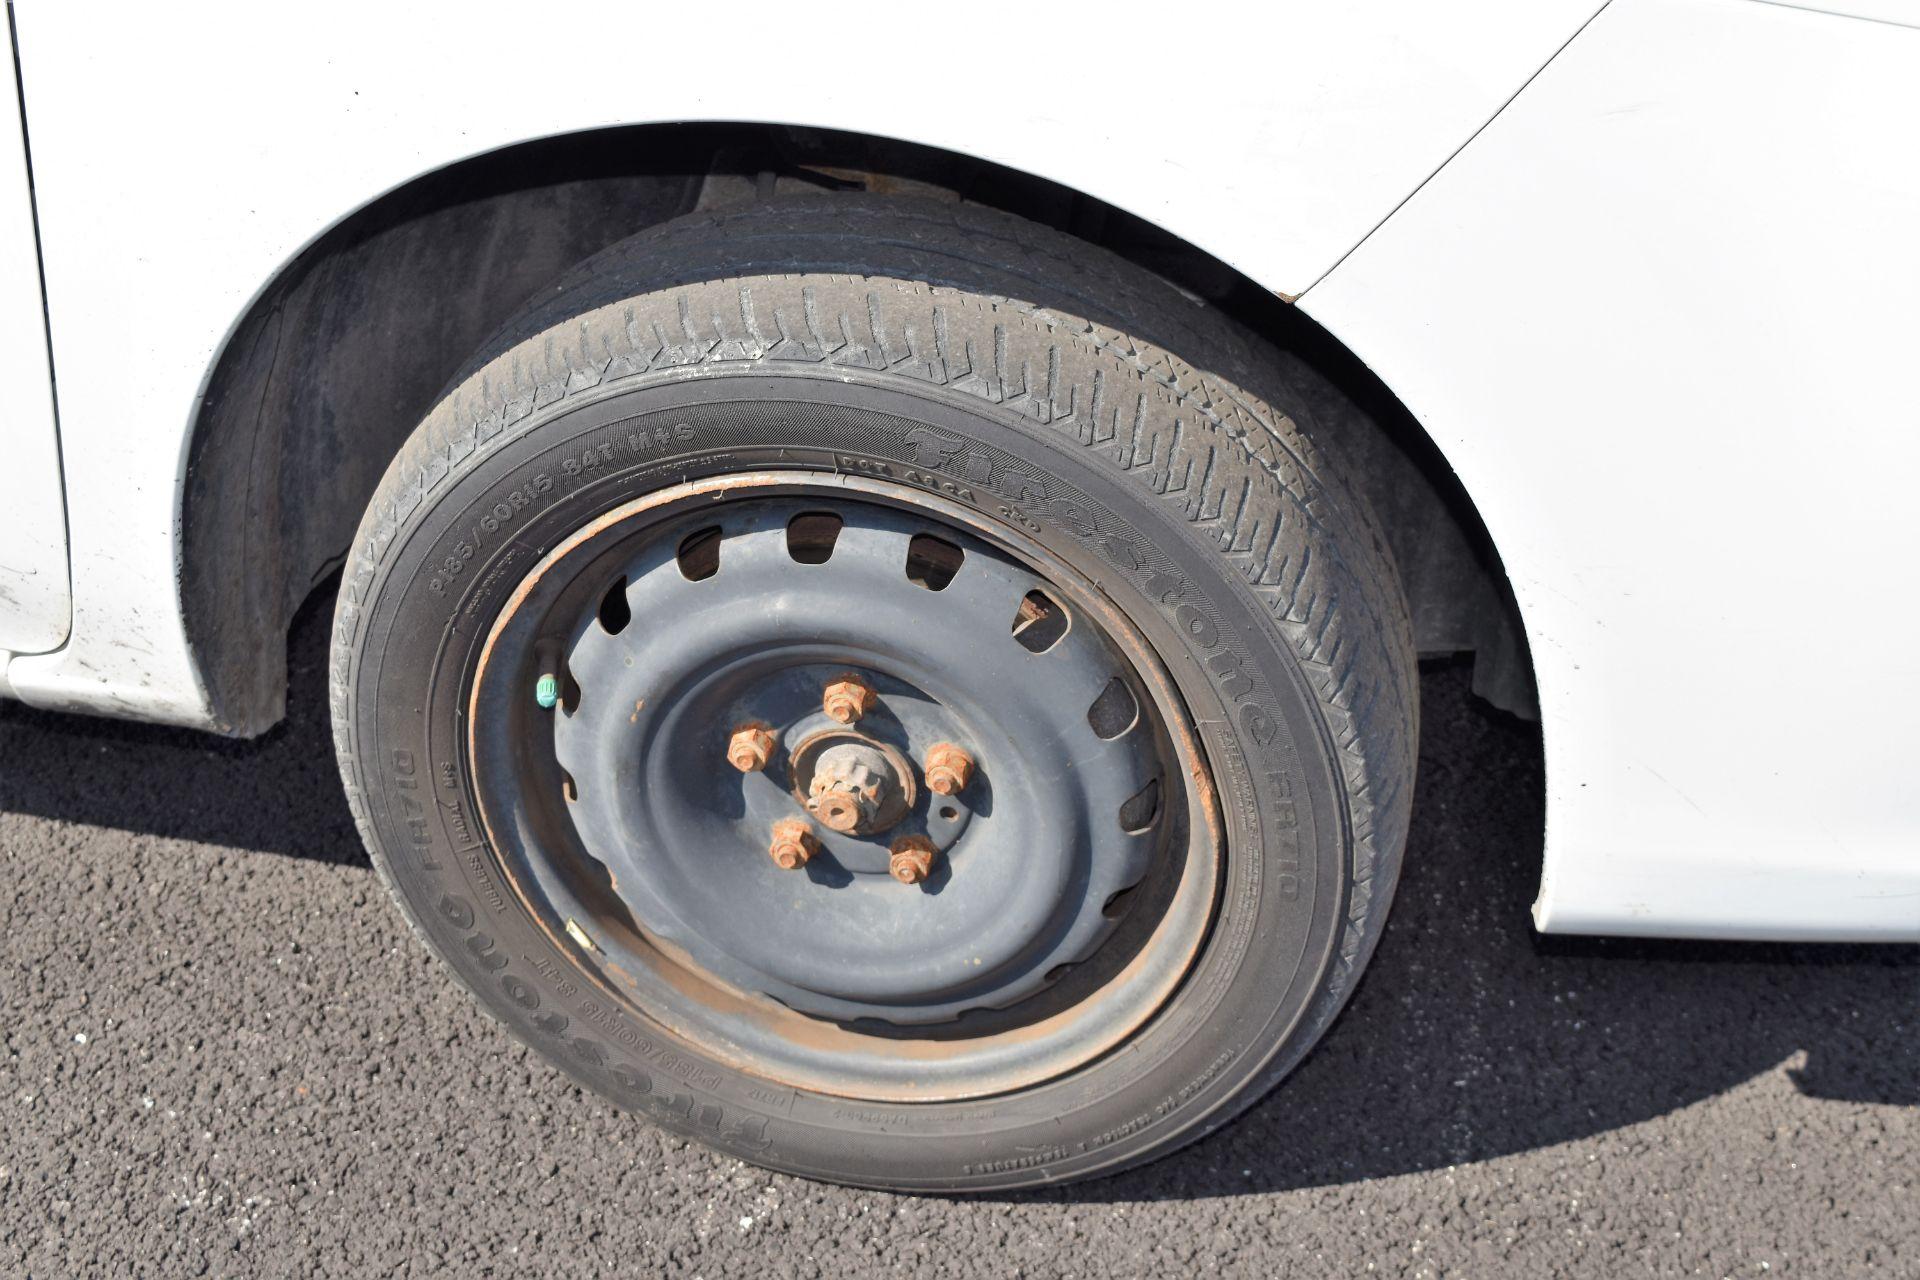 2013 Nissan NV200 Delivery Van - Image 36 of 54